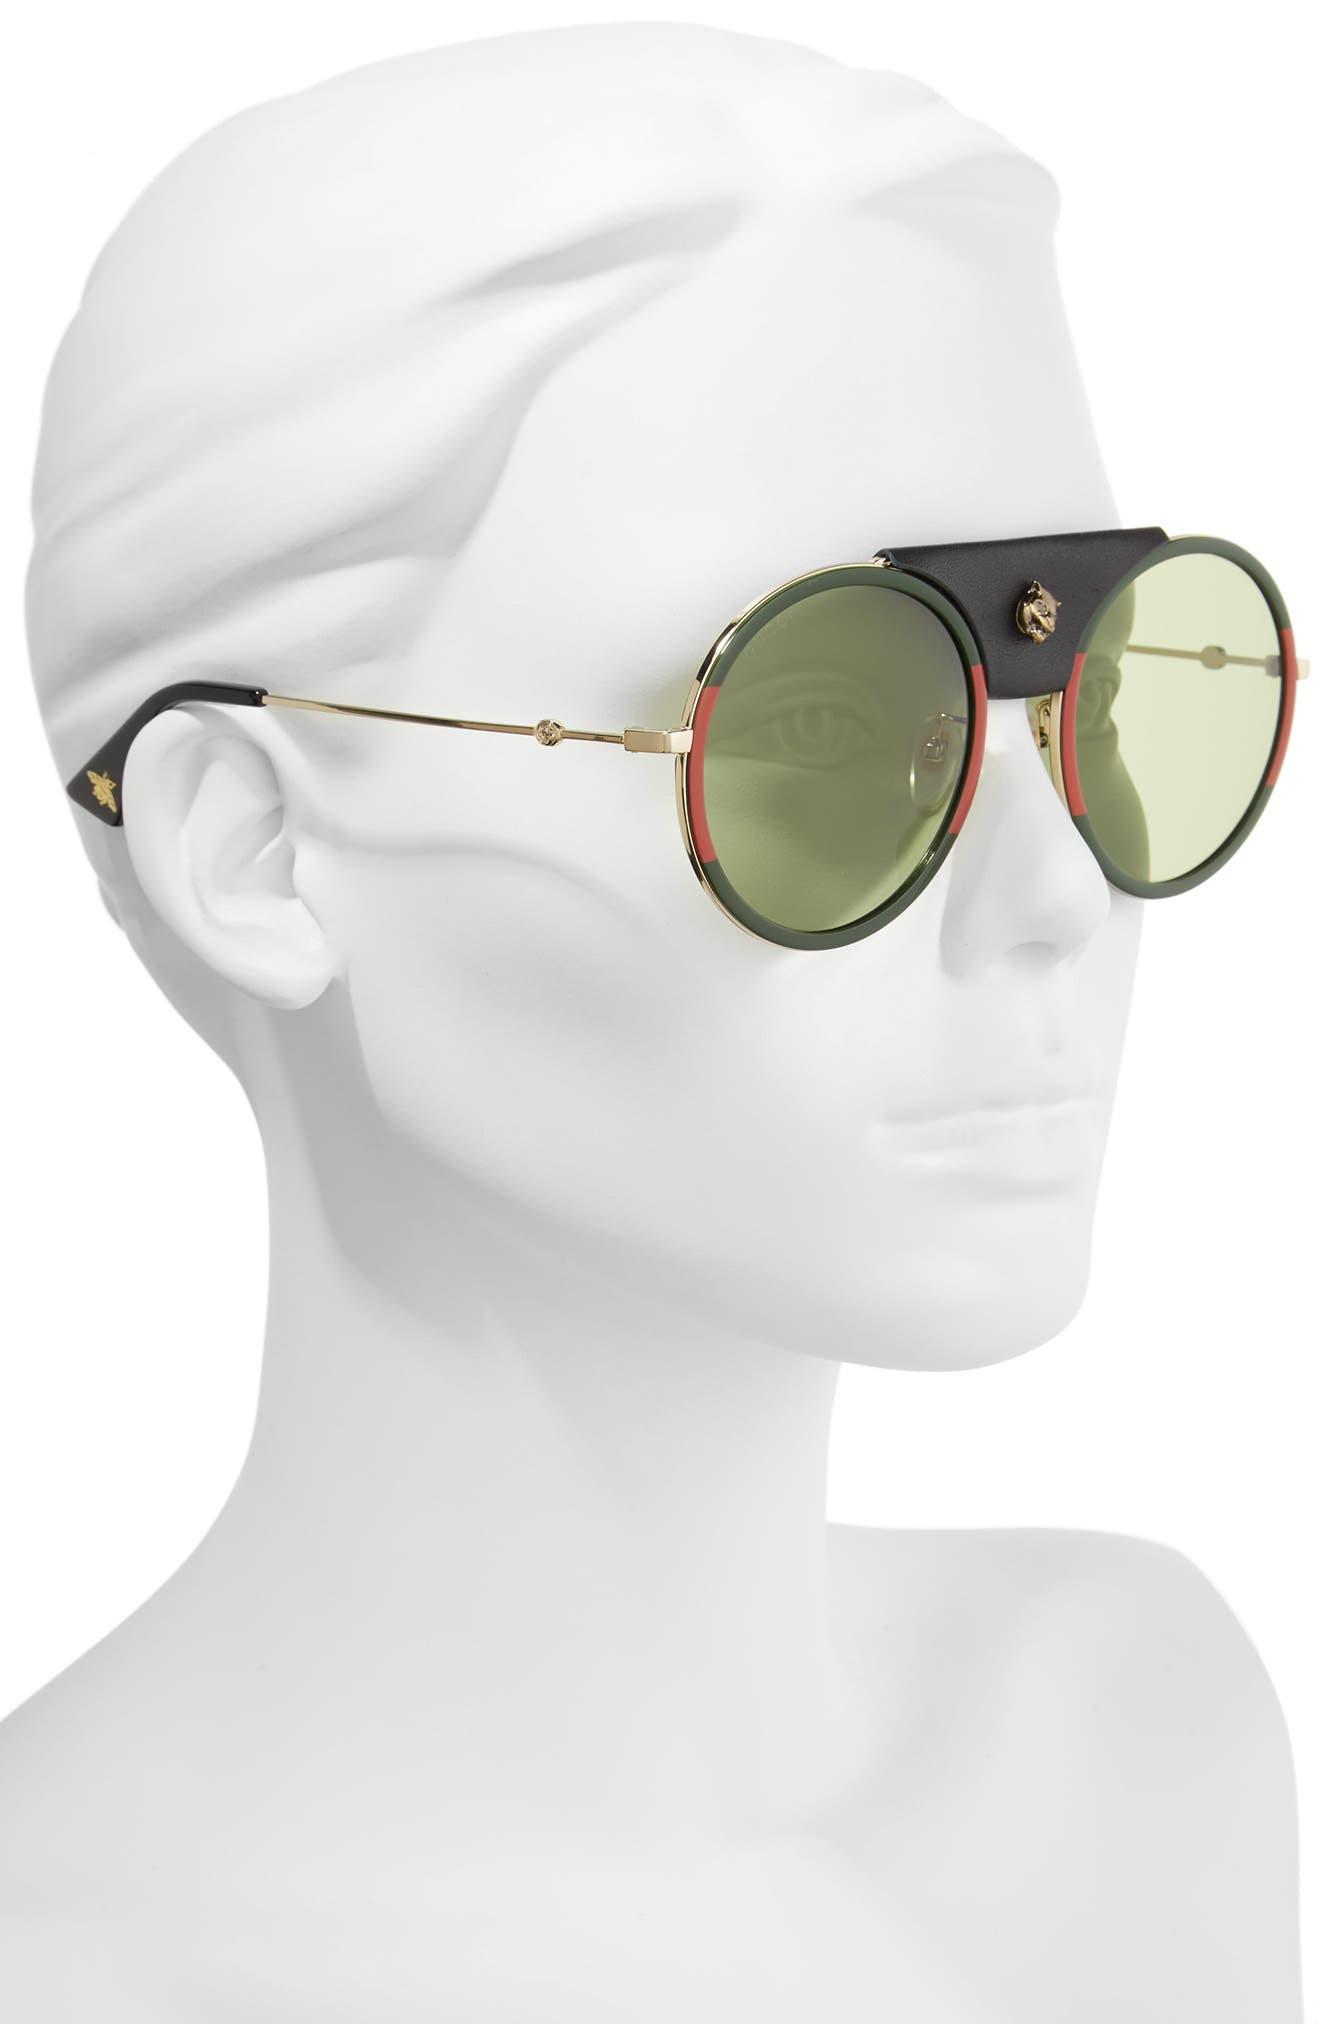 56mm Leather Bridge Aviator Sunglasses,                             Alternate thumbnail 2, color,                             Gold/ Black